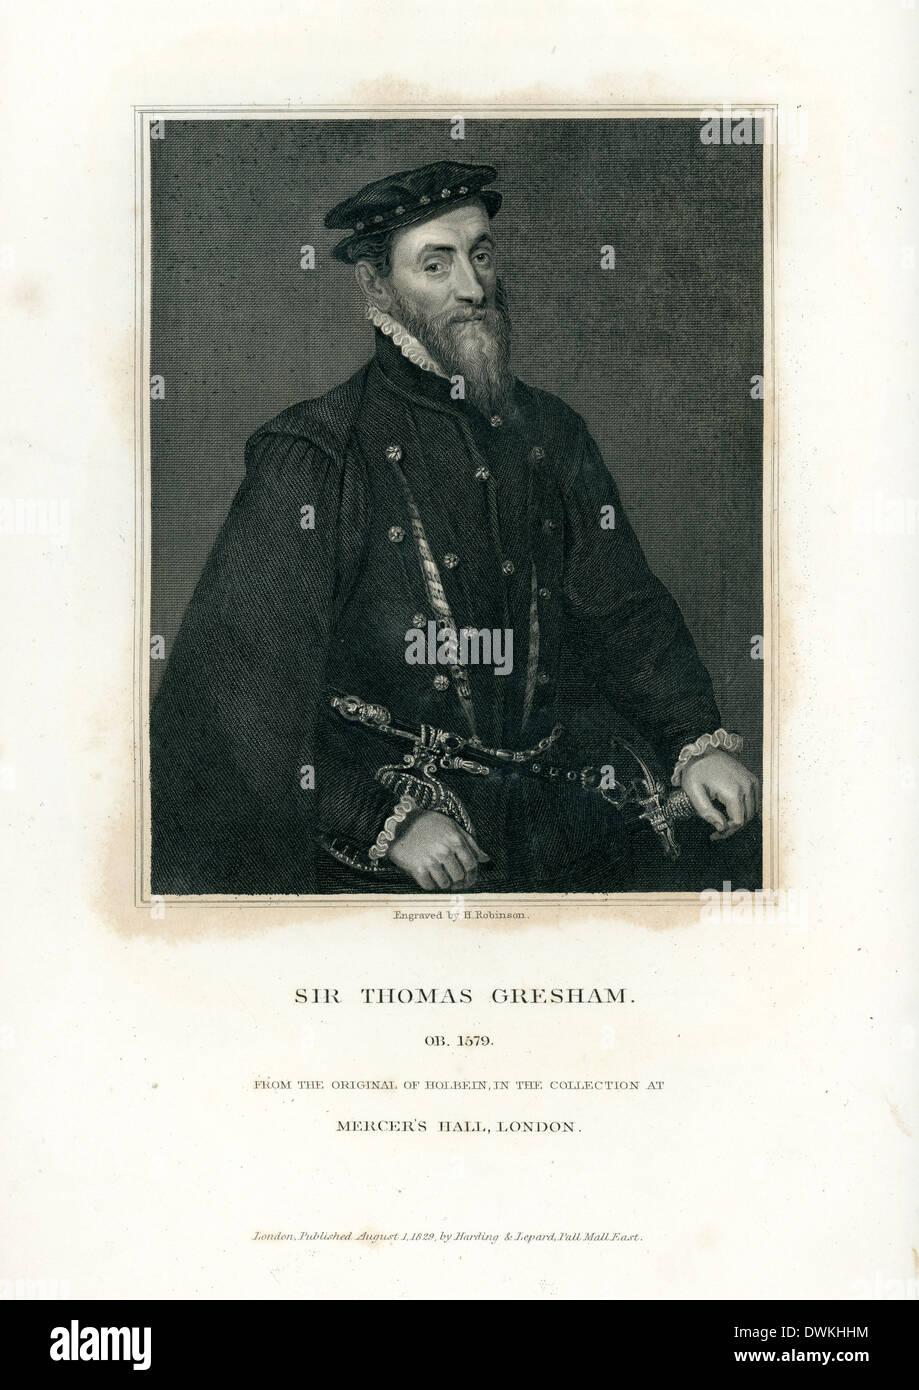 Portrait of Sir Thomas Gresham an English merchant and financier - Stock Image